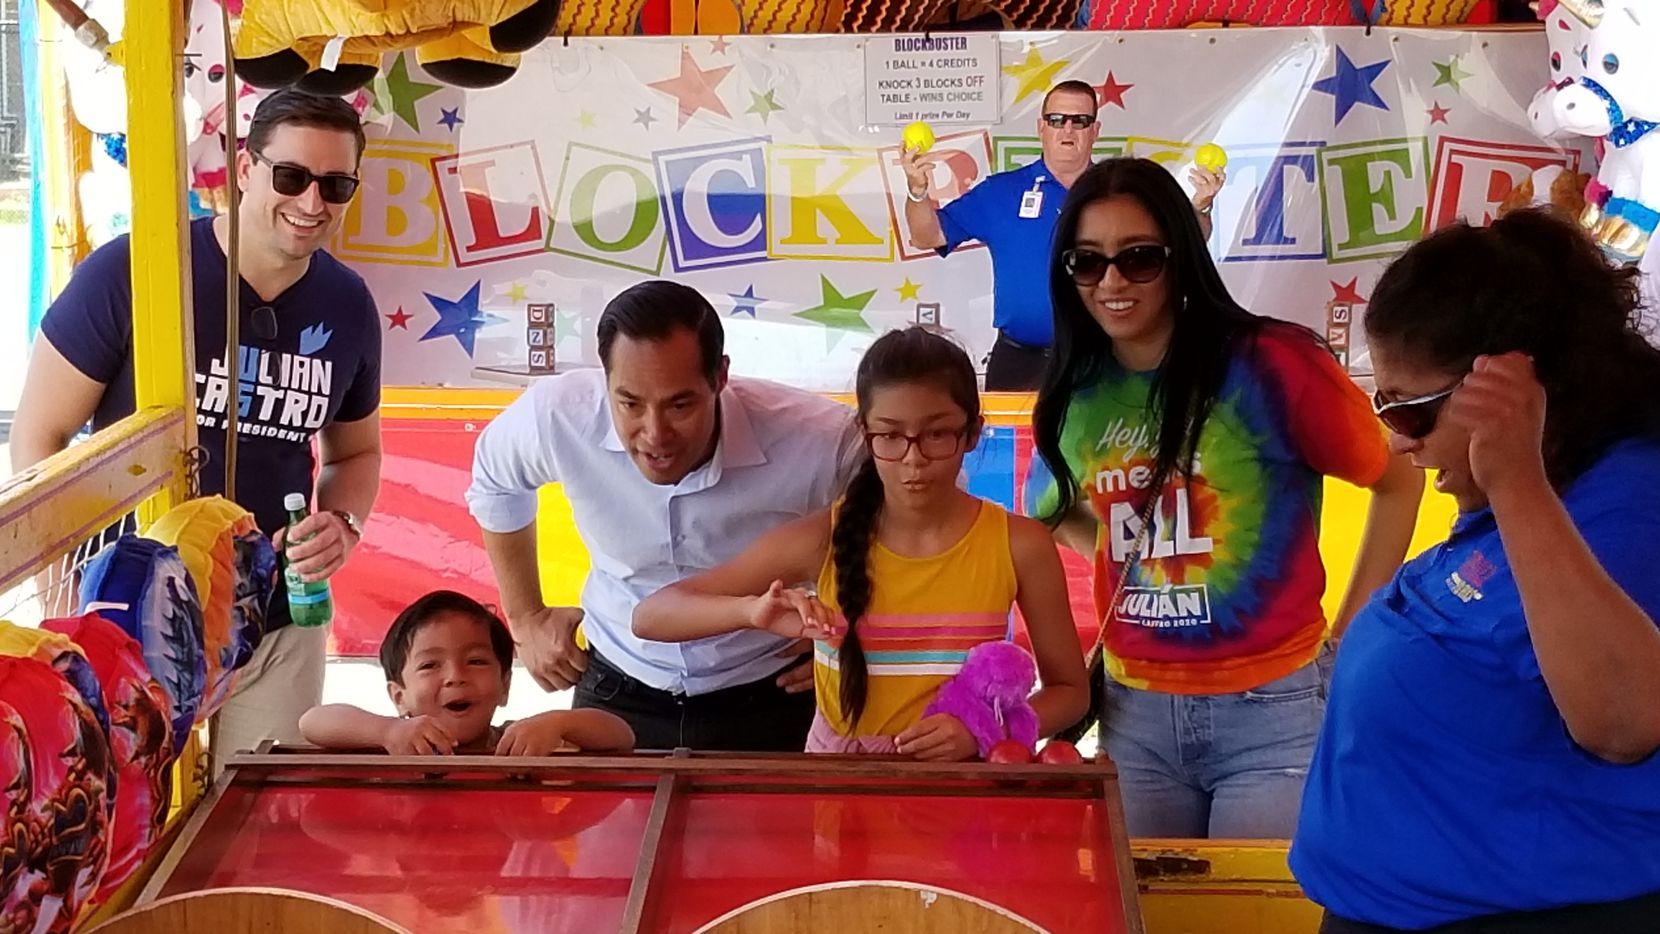 Cristián Castro, 4, and his sister Carina, 10, play Rainbow Roll at the Iowa State Fair on Aug. 9, 2019, as parents Julián and Erica Castro look on.